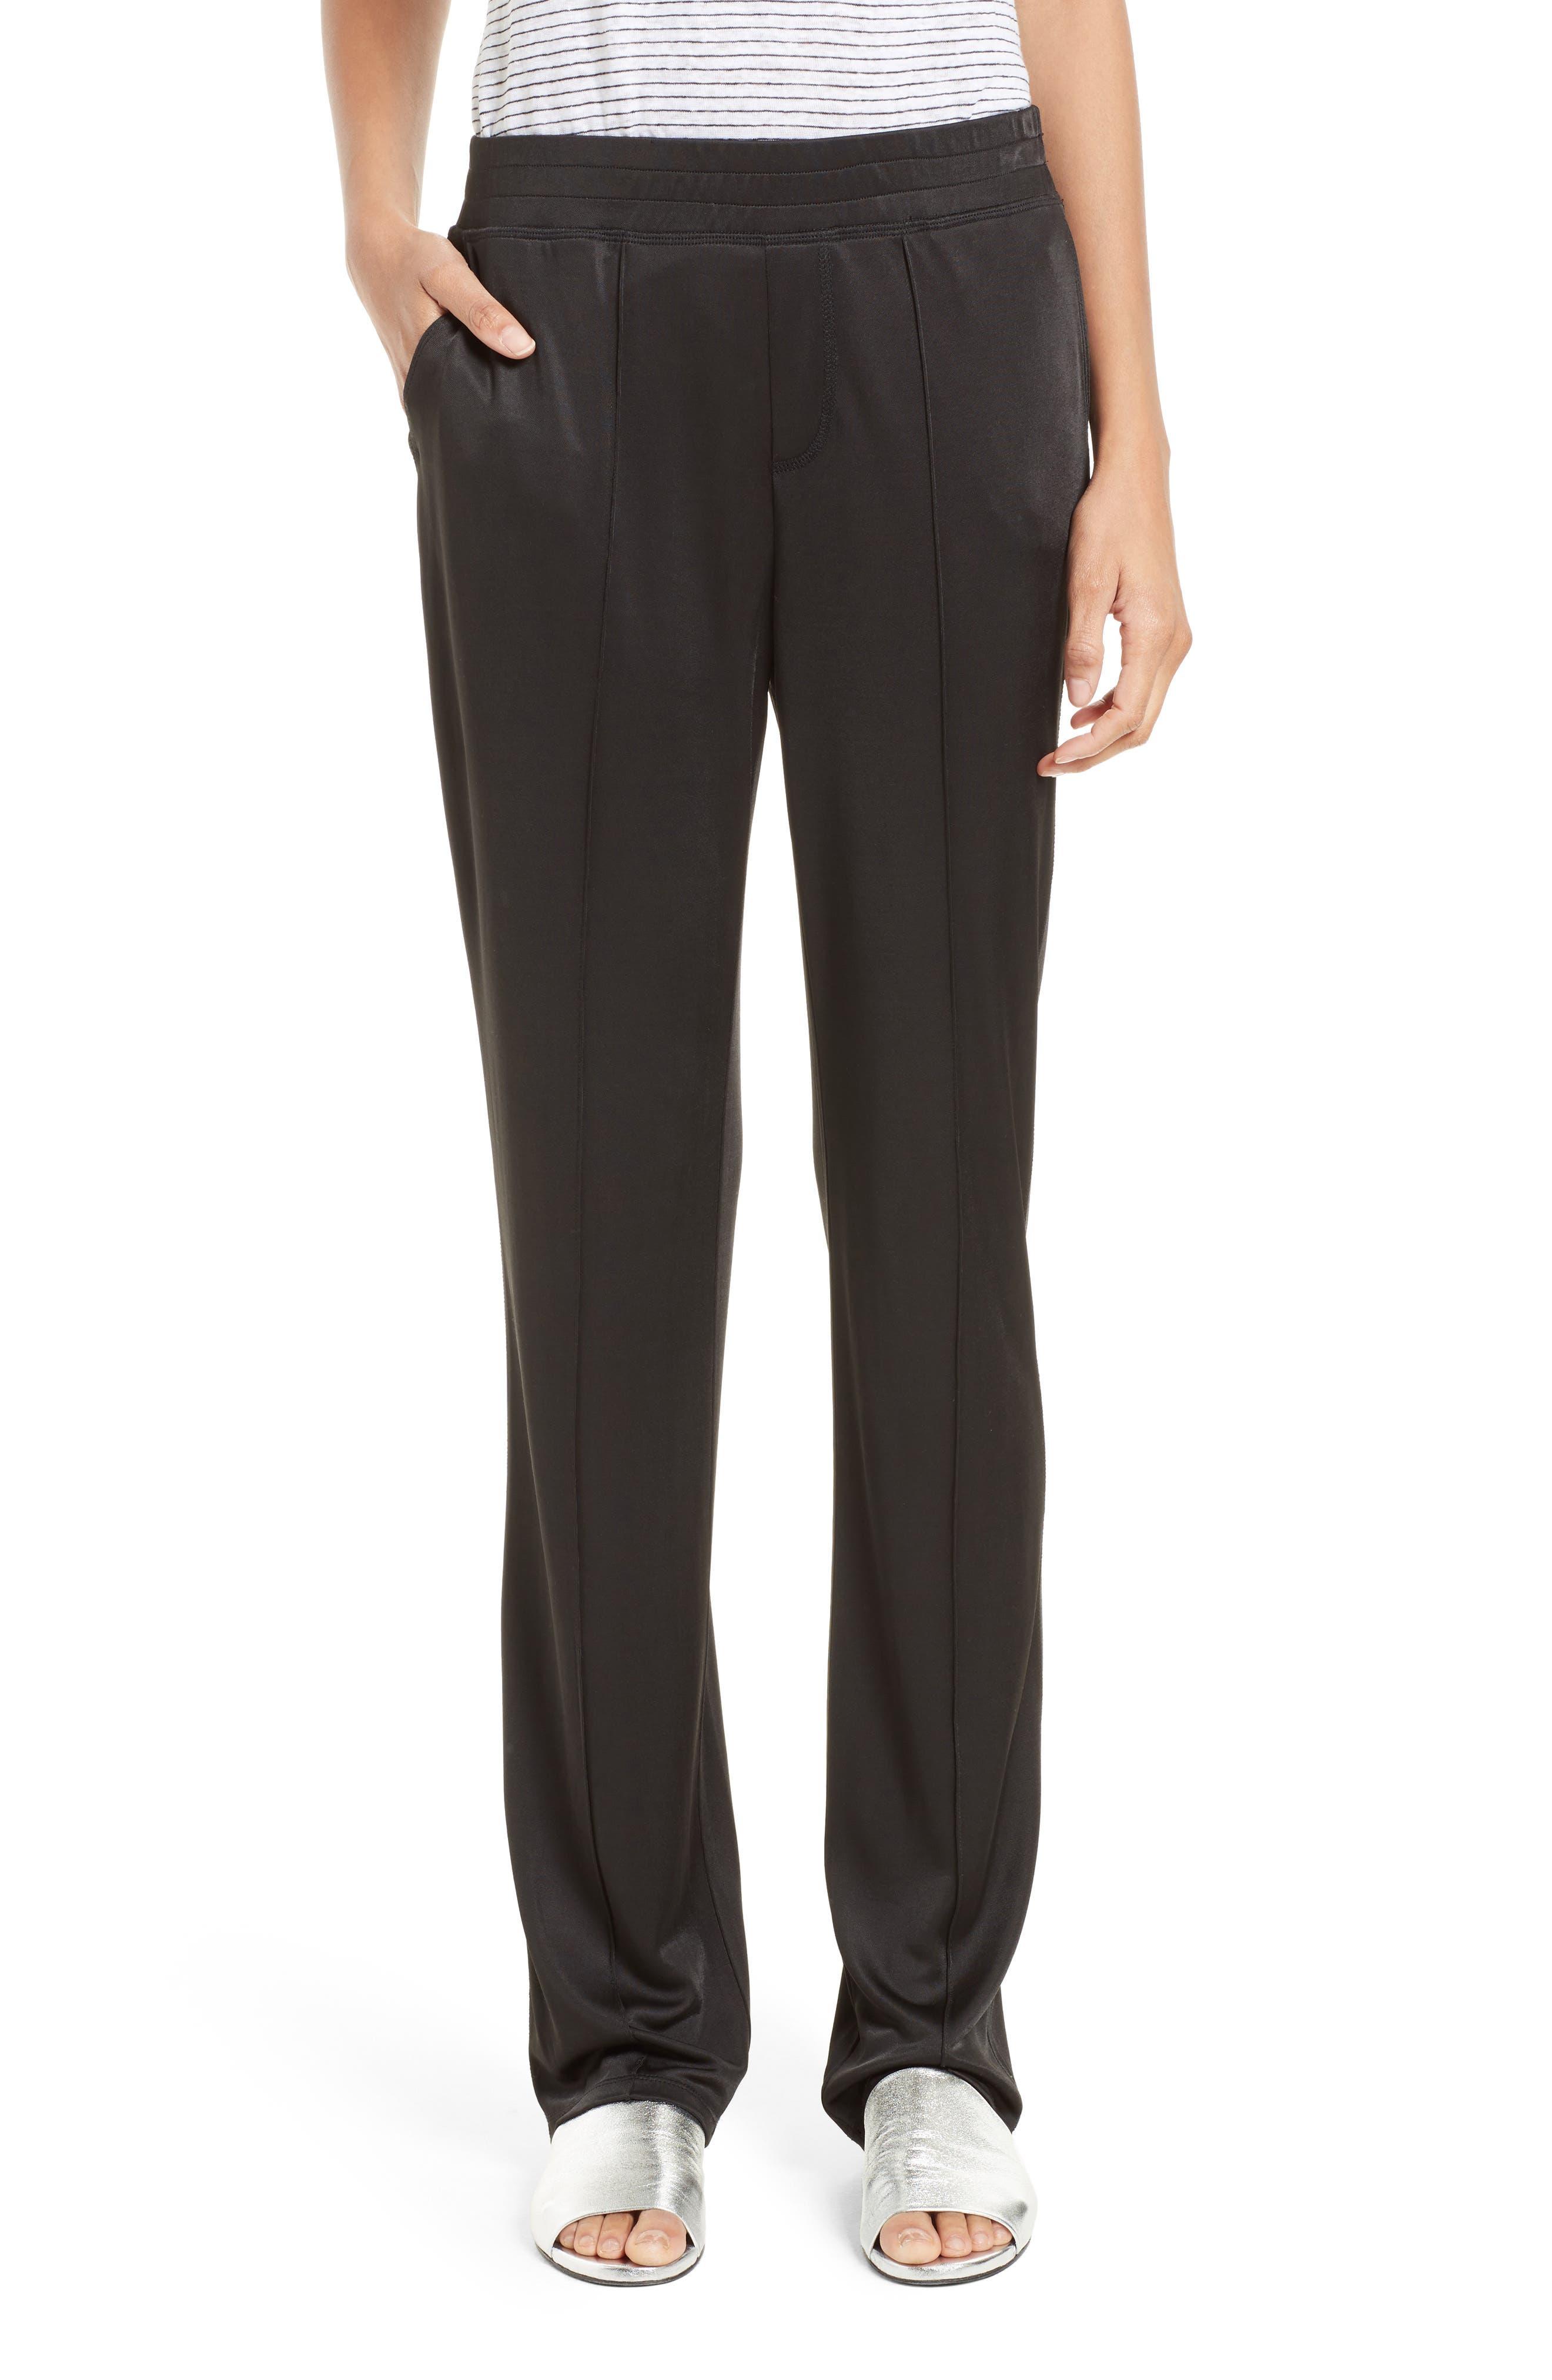 Interlock Track Pants,                         Main,                         color, Black